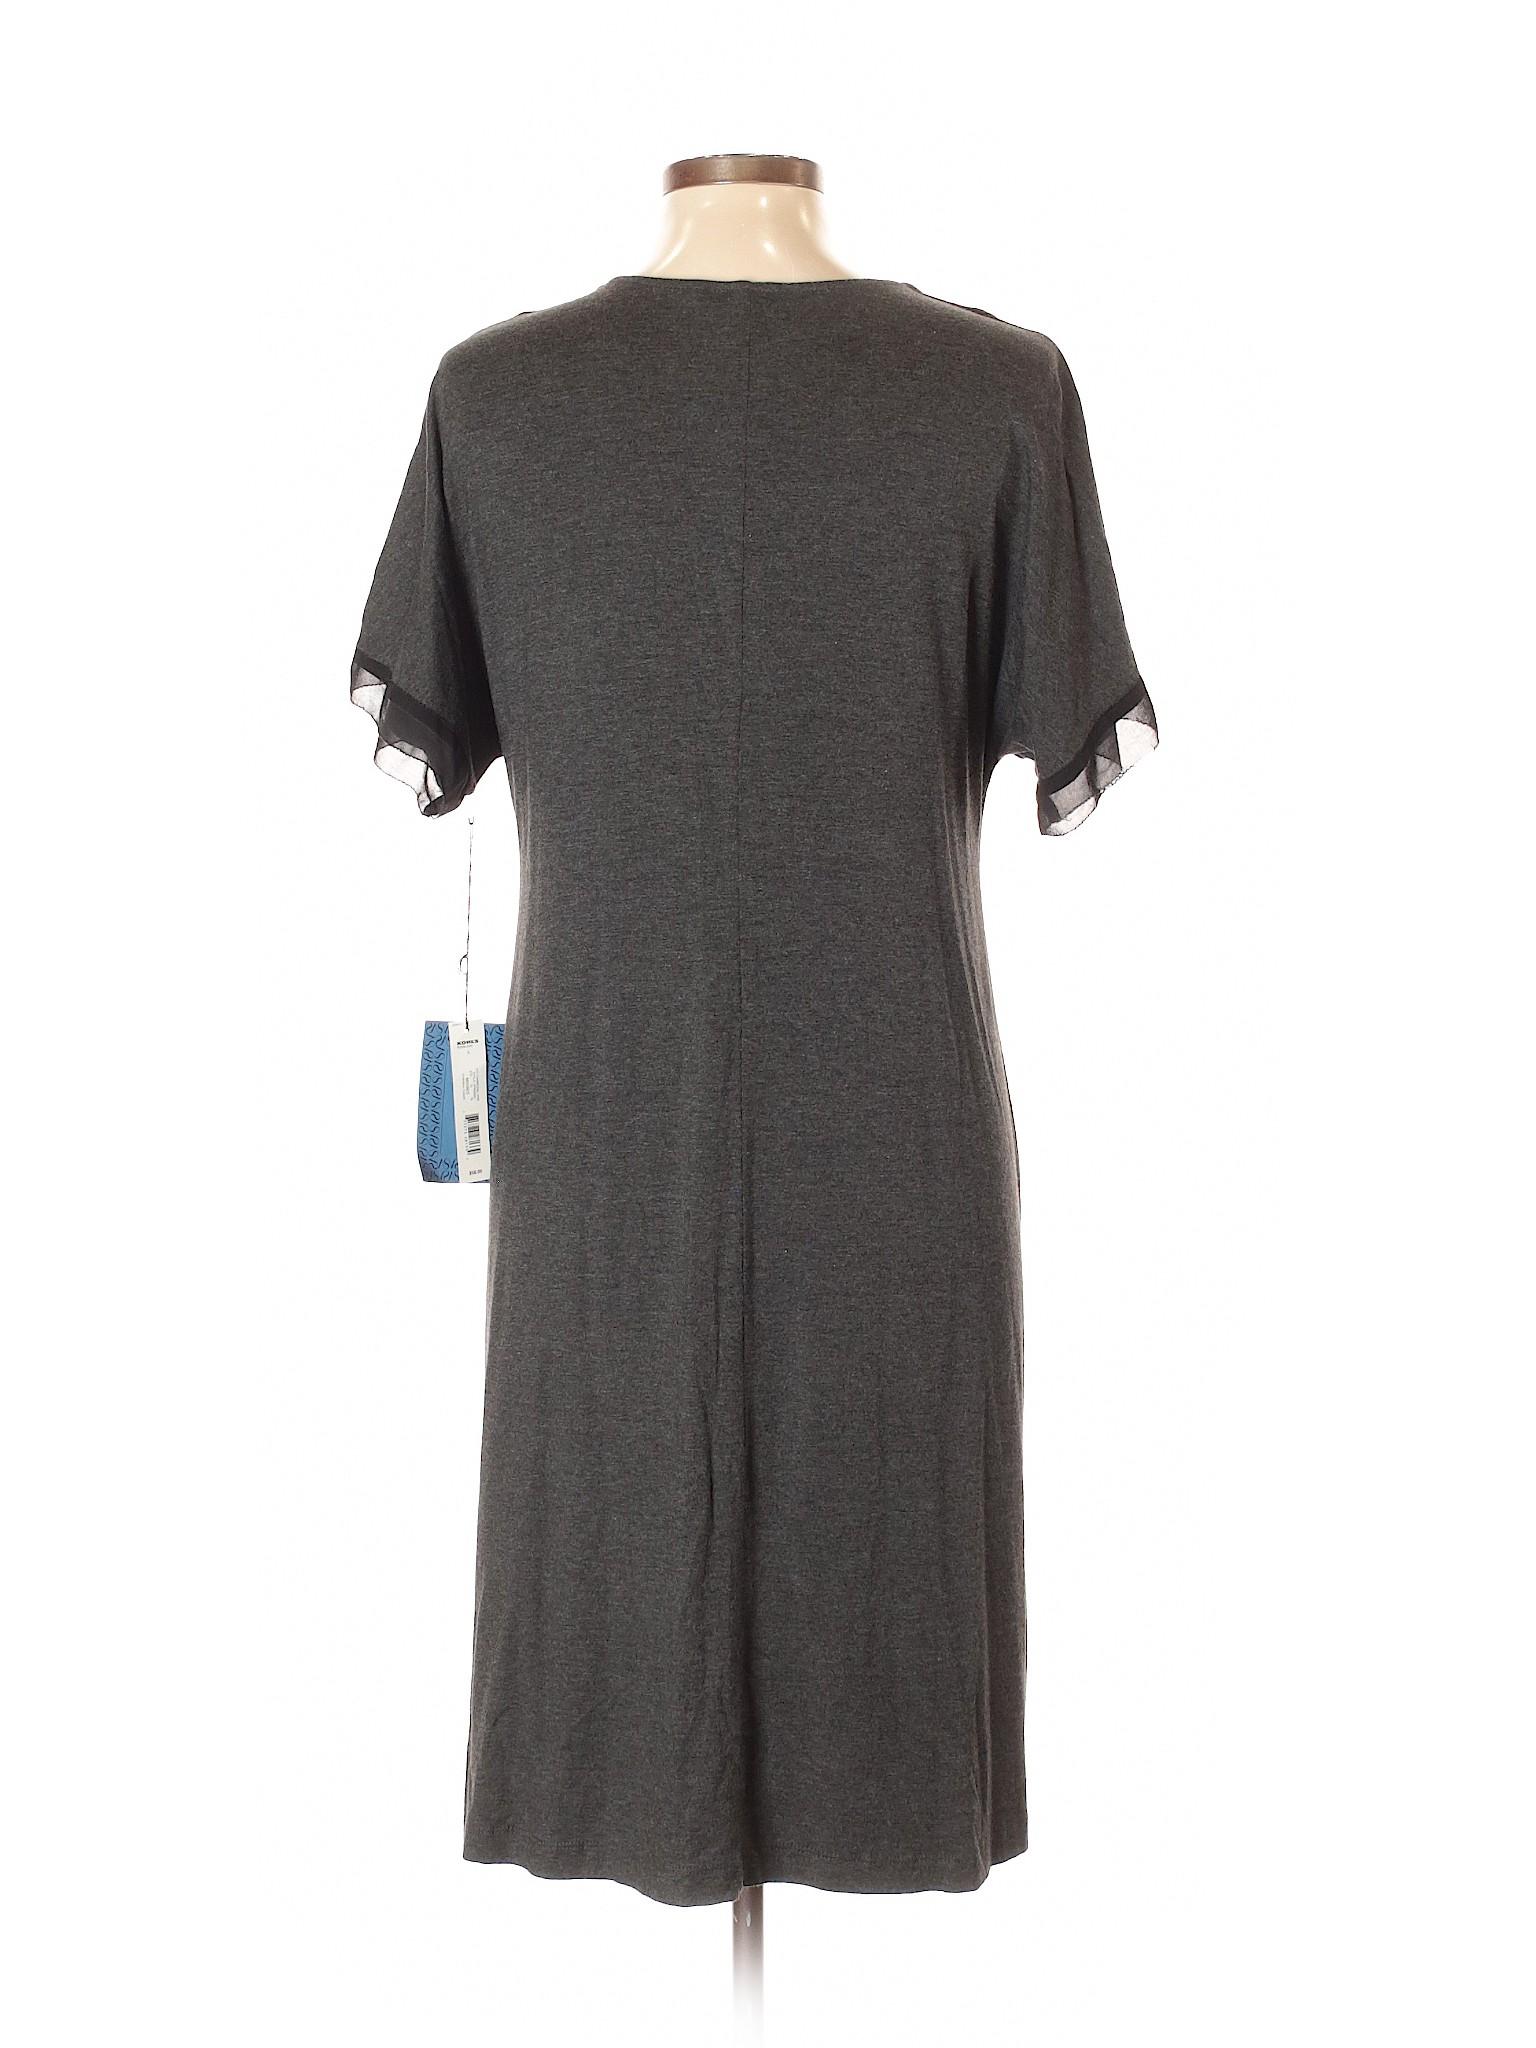 Dress Wang Vera Simply Vera Selling Casual T8Hzxn